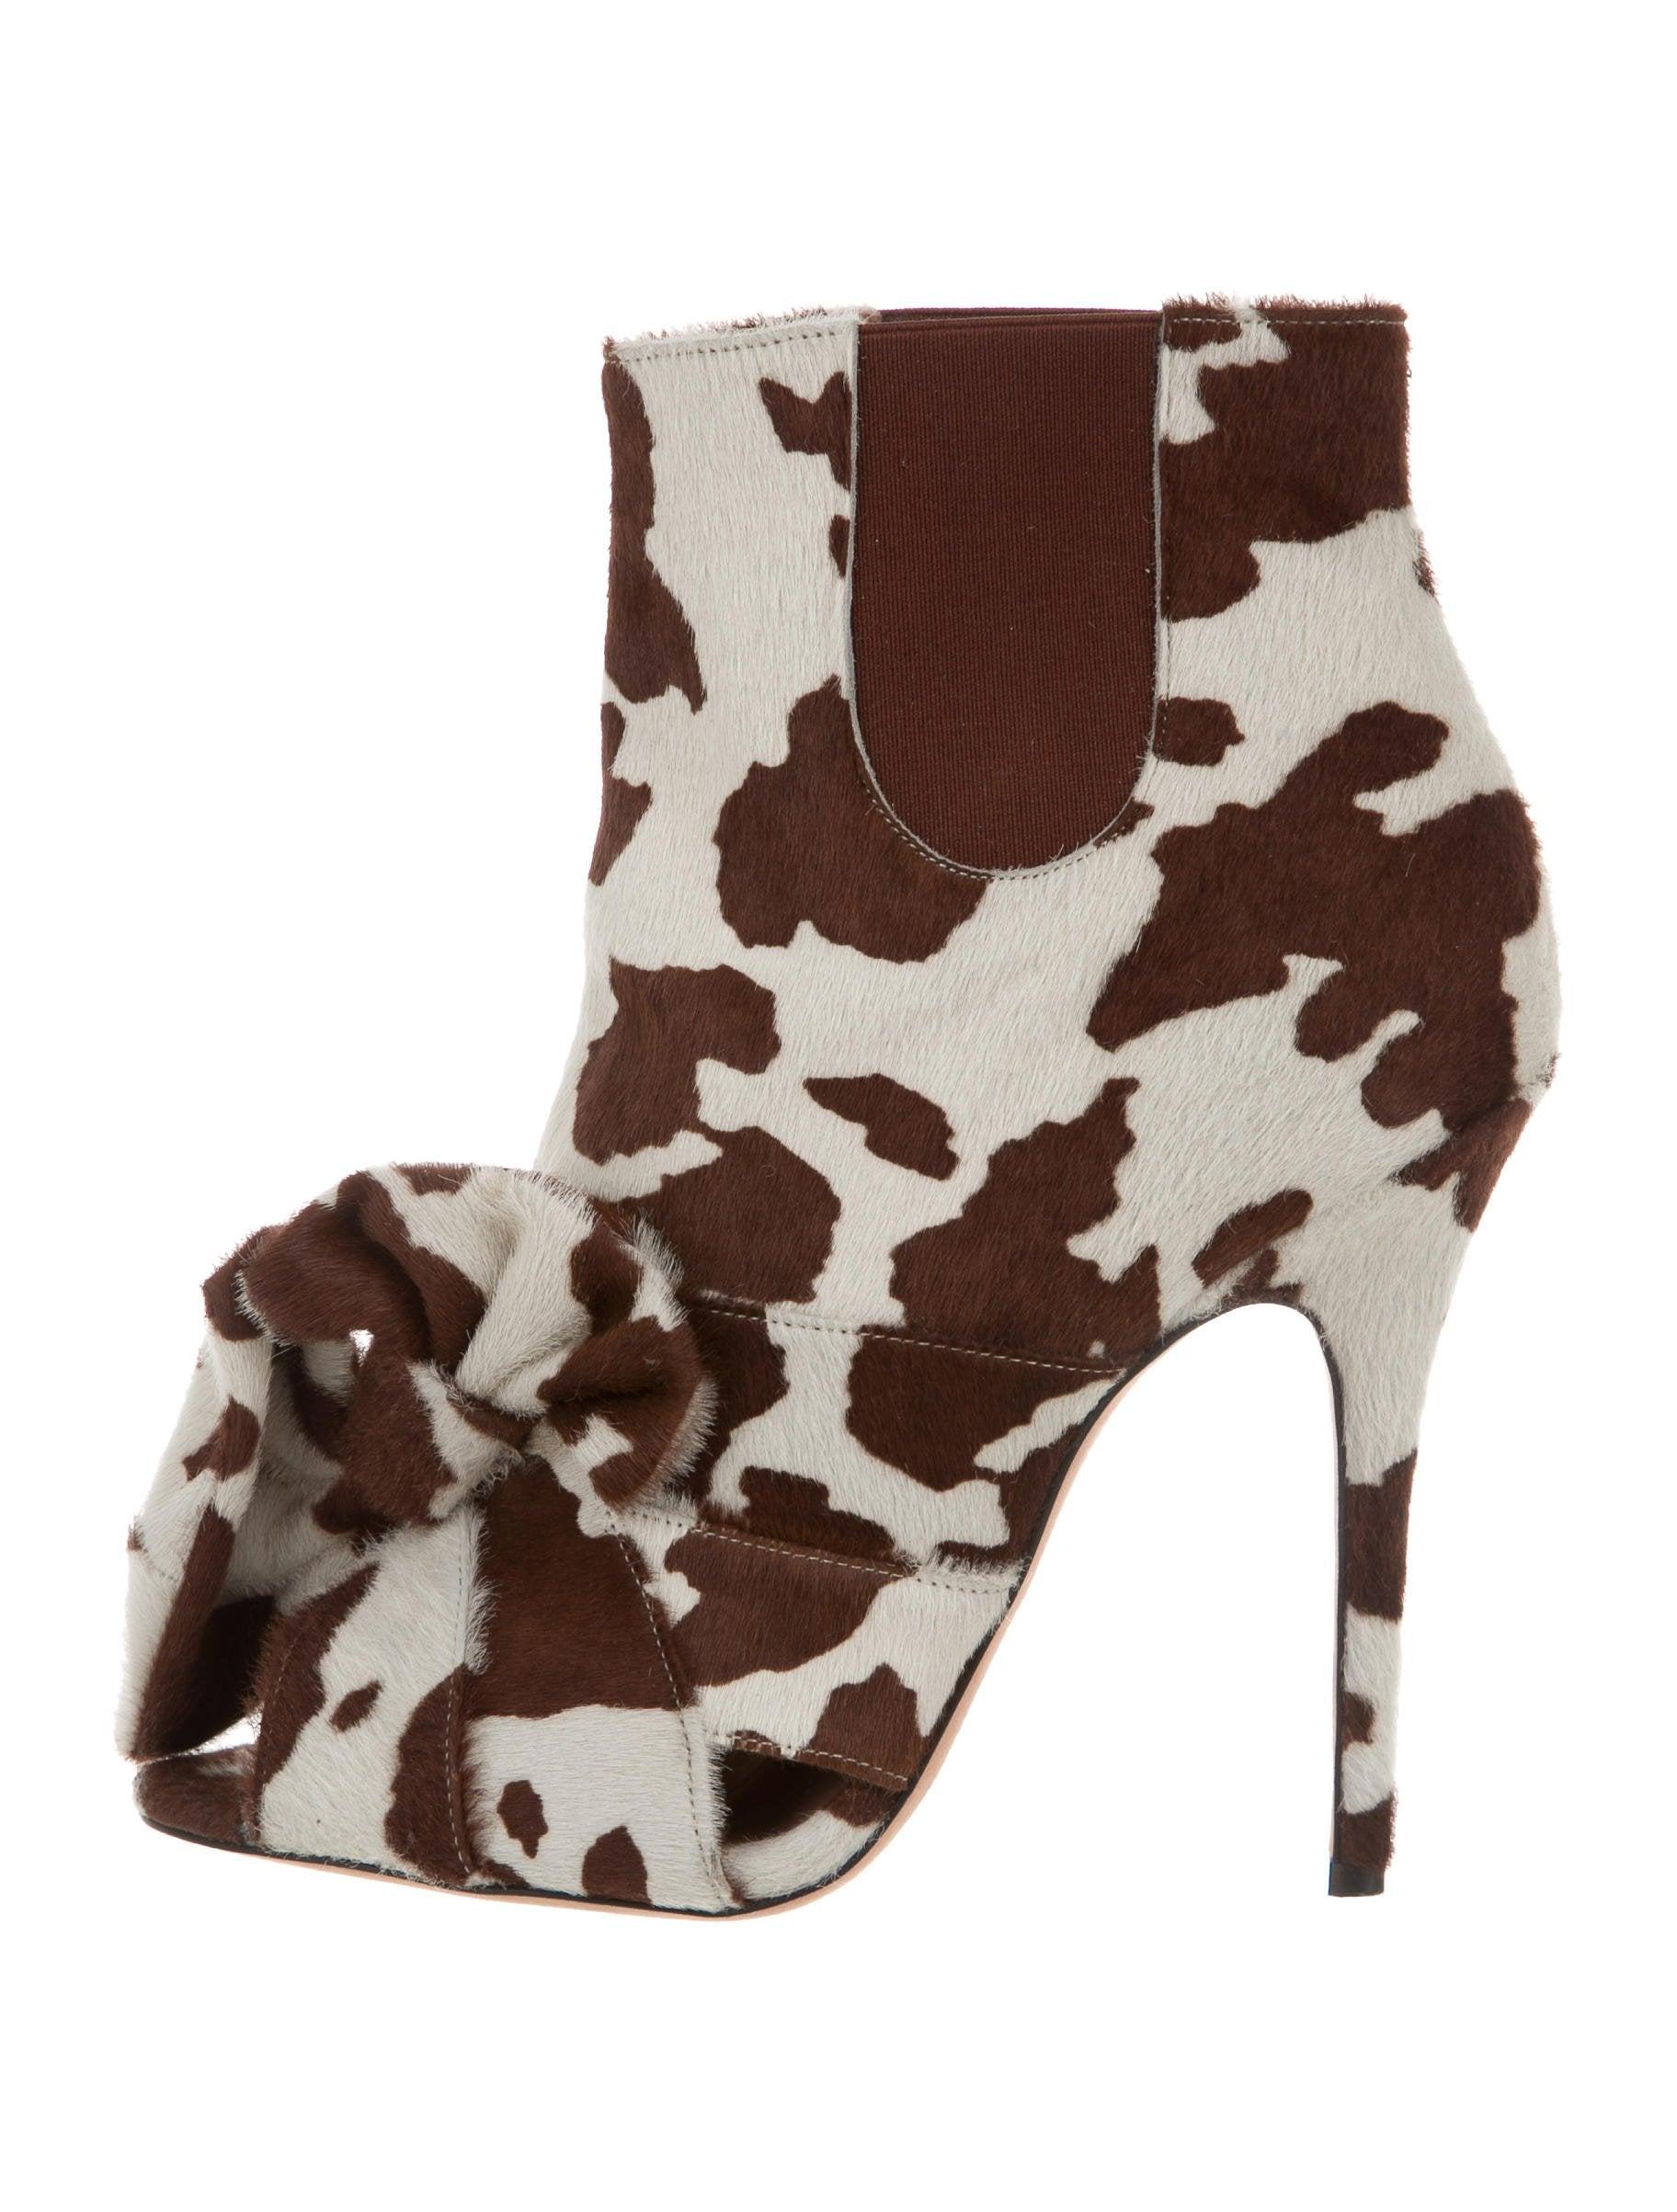 top quality Jean-Michel Cazabat for Sophie Theallet Ponyhair Peep-Toe Ankle Boots 100% original sale online visa payment VDRAGSjYQH